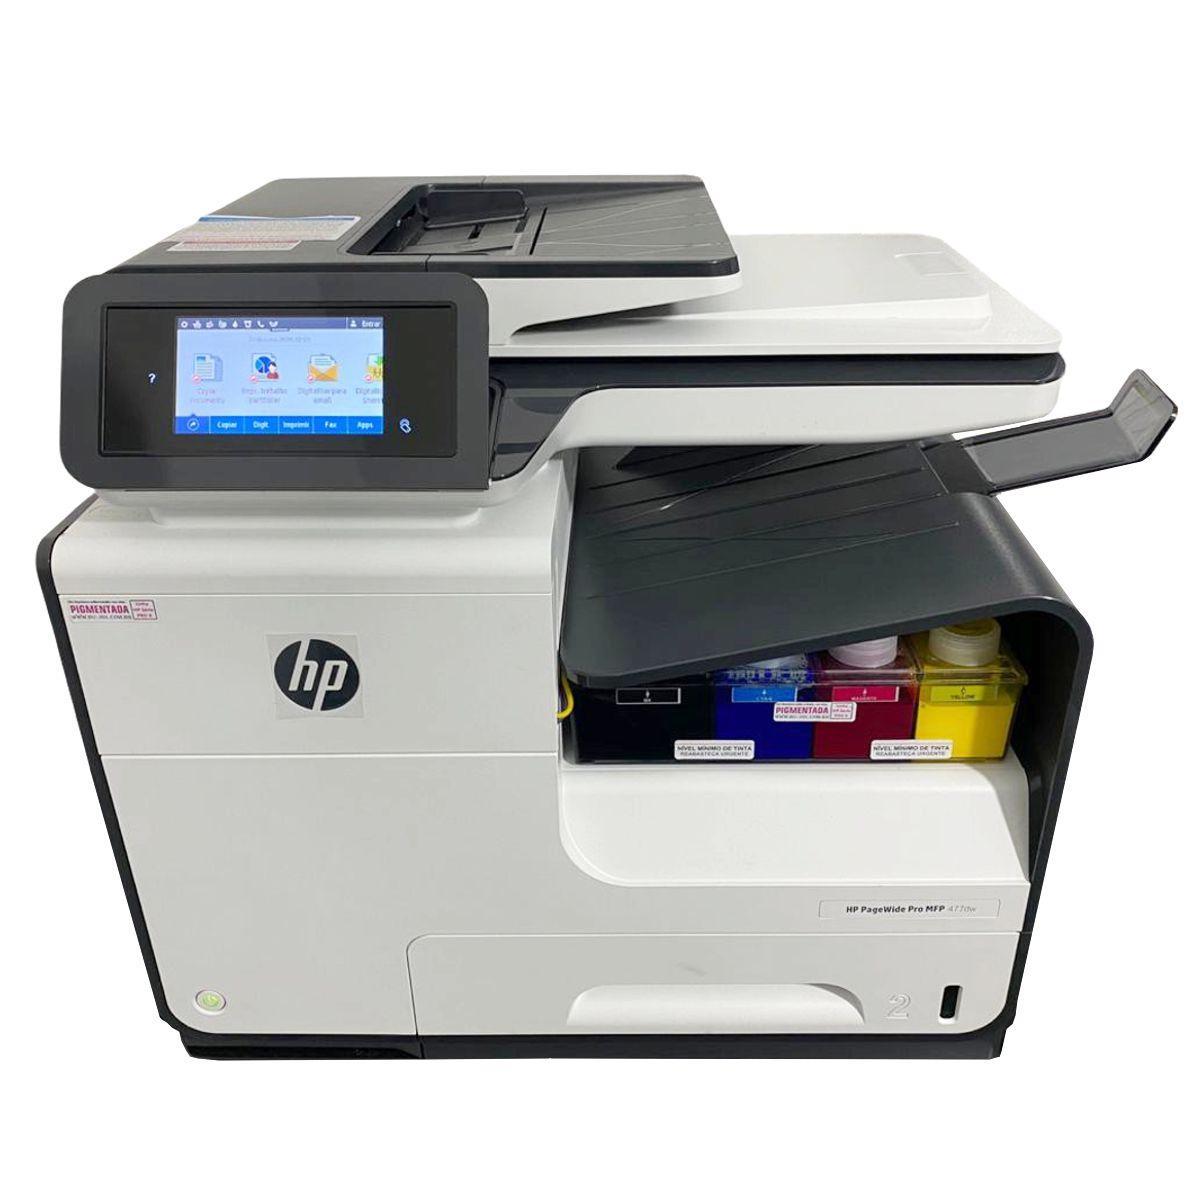 IMPRESSORA MULTIFUNCIONAL HP OFFICEJET PRO 477DW COM BULK INK INSTALADO TINTA PIGMENTADA